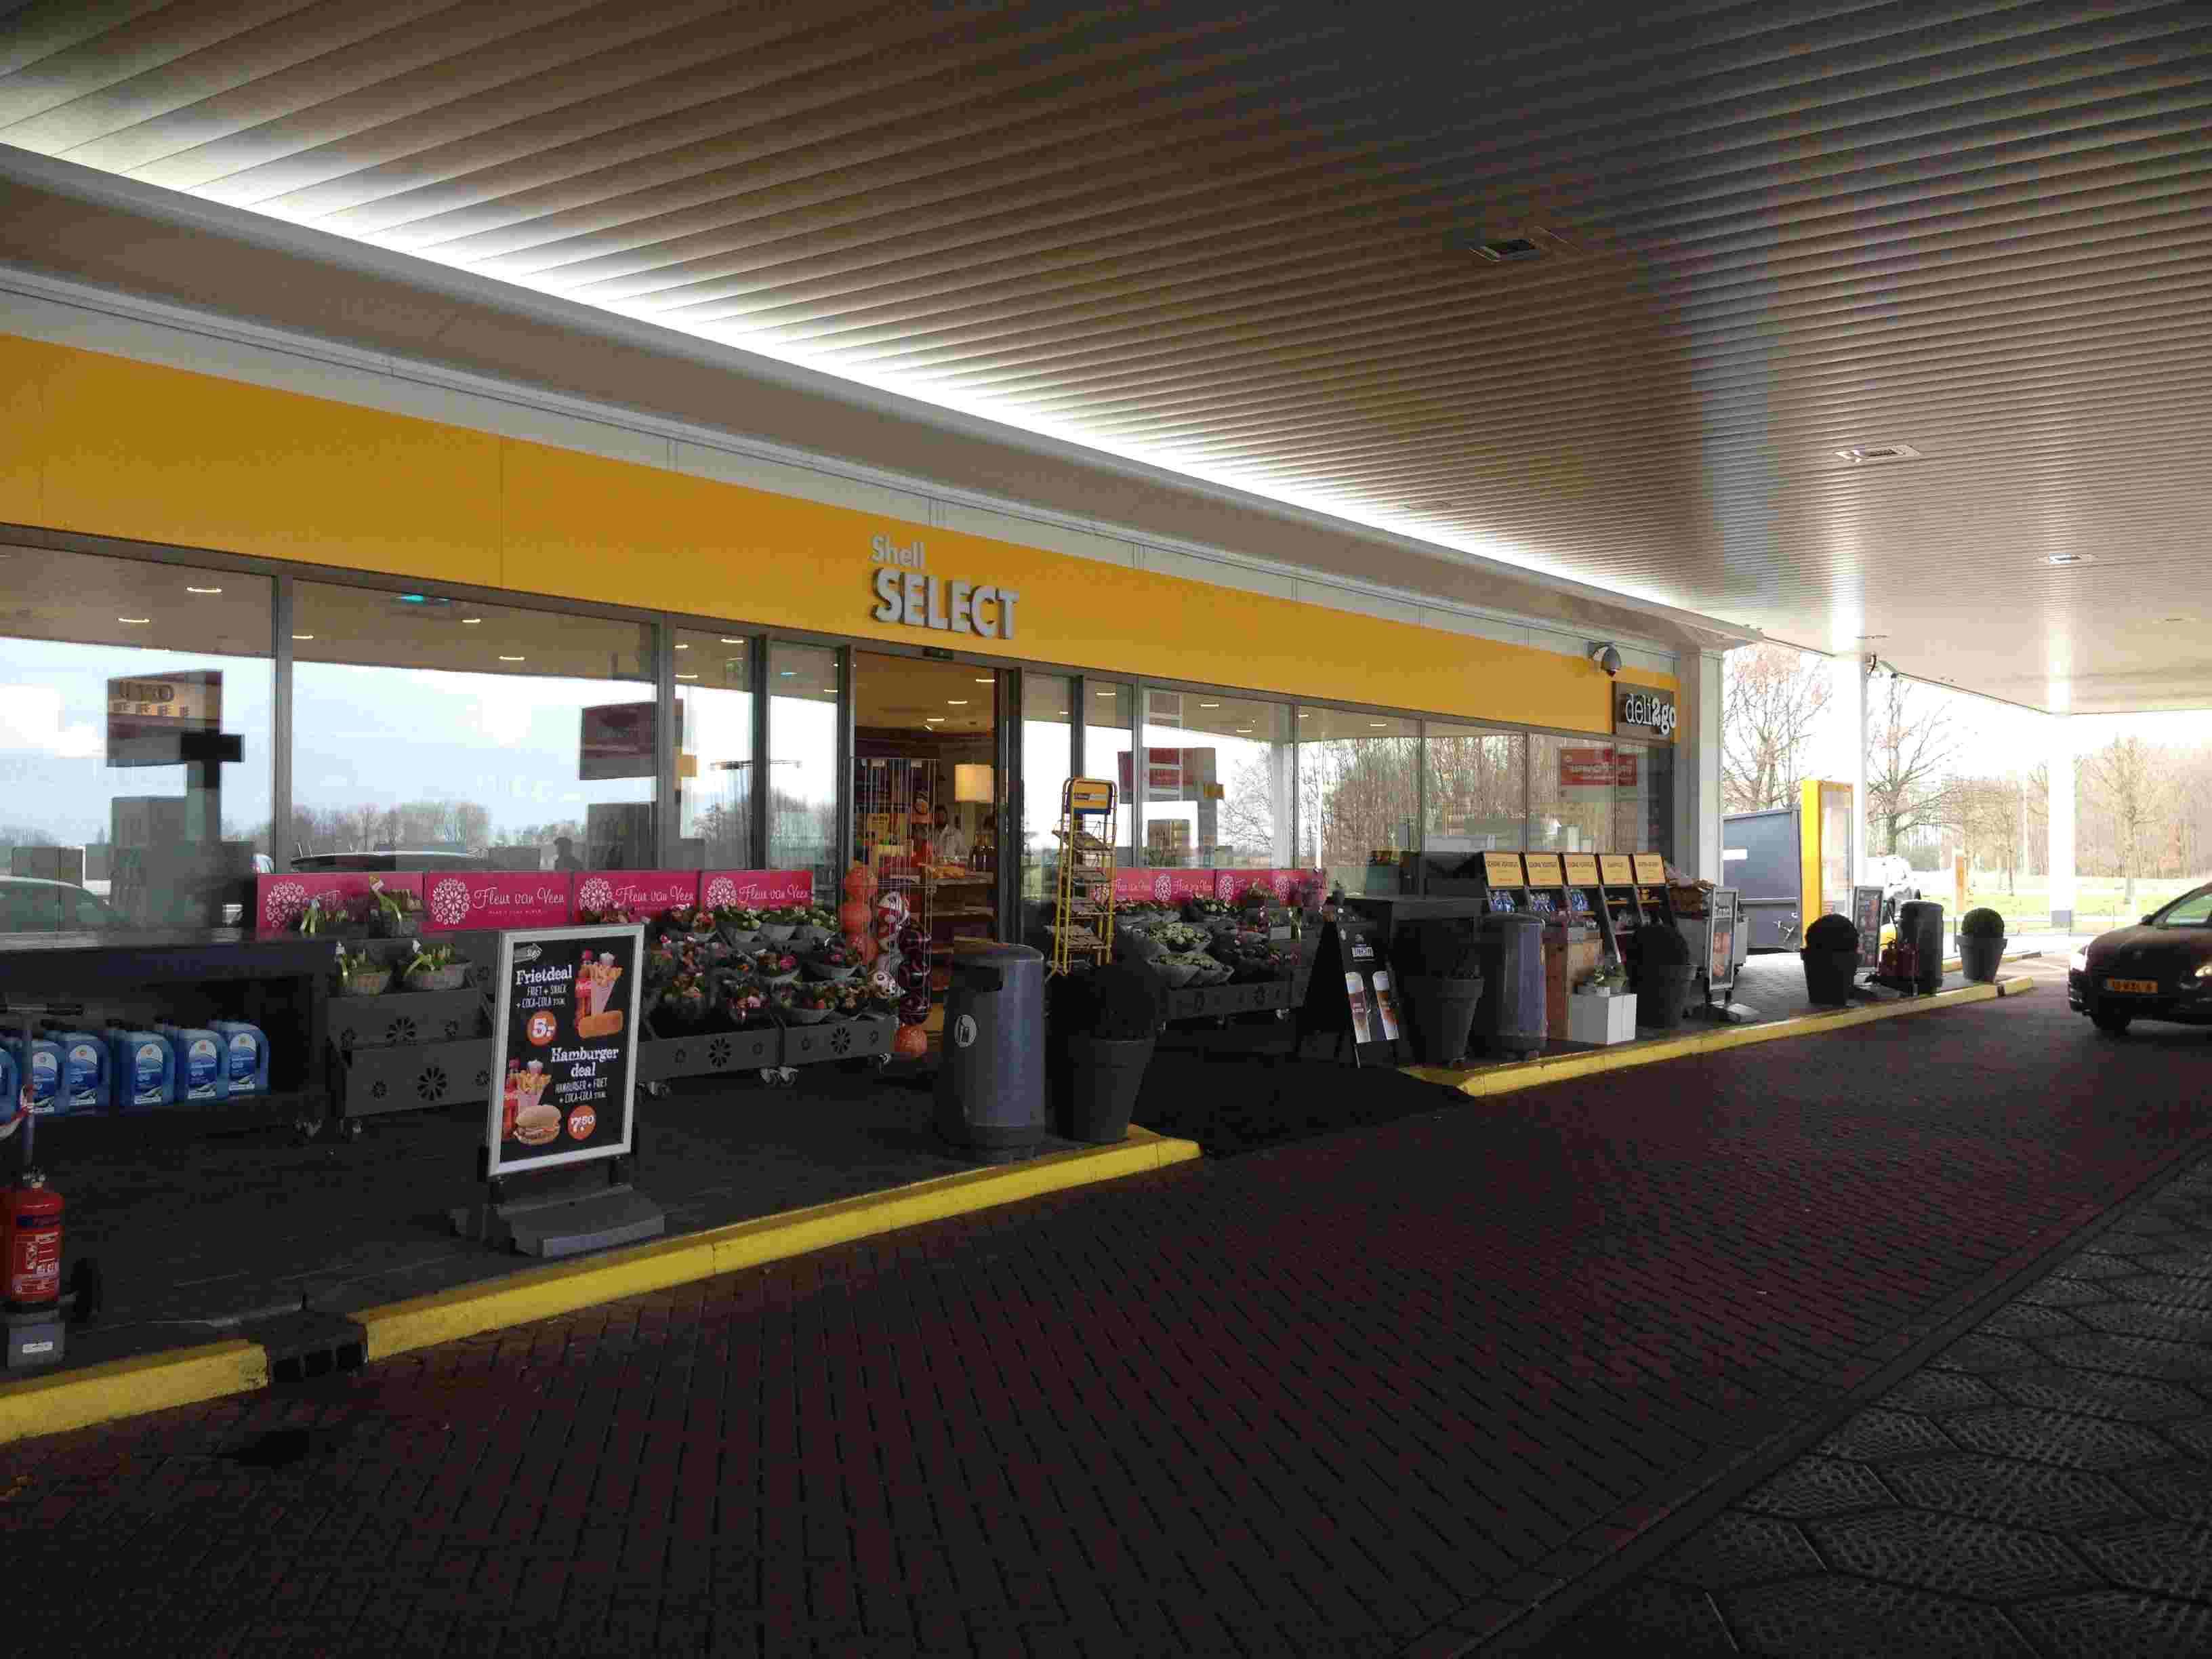 Shell Tankstation Haarrijn (Deli2go)